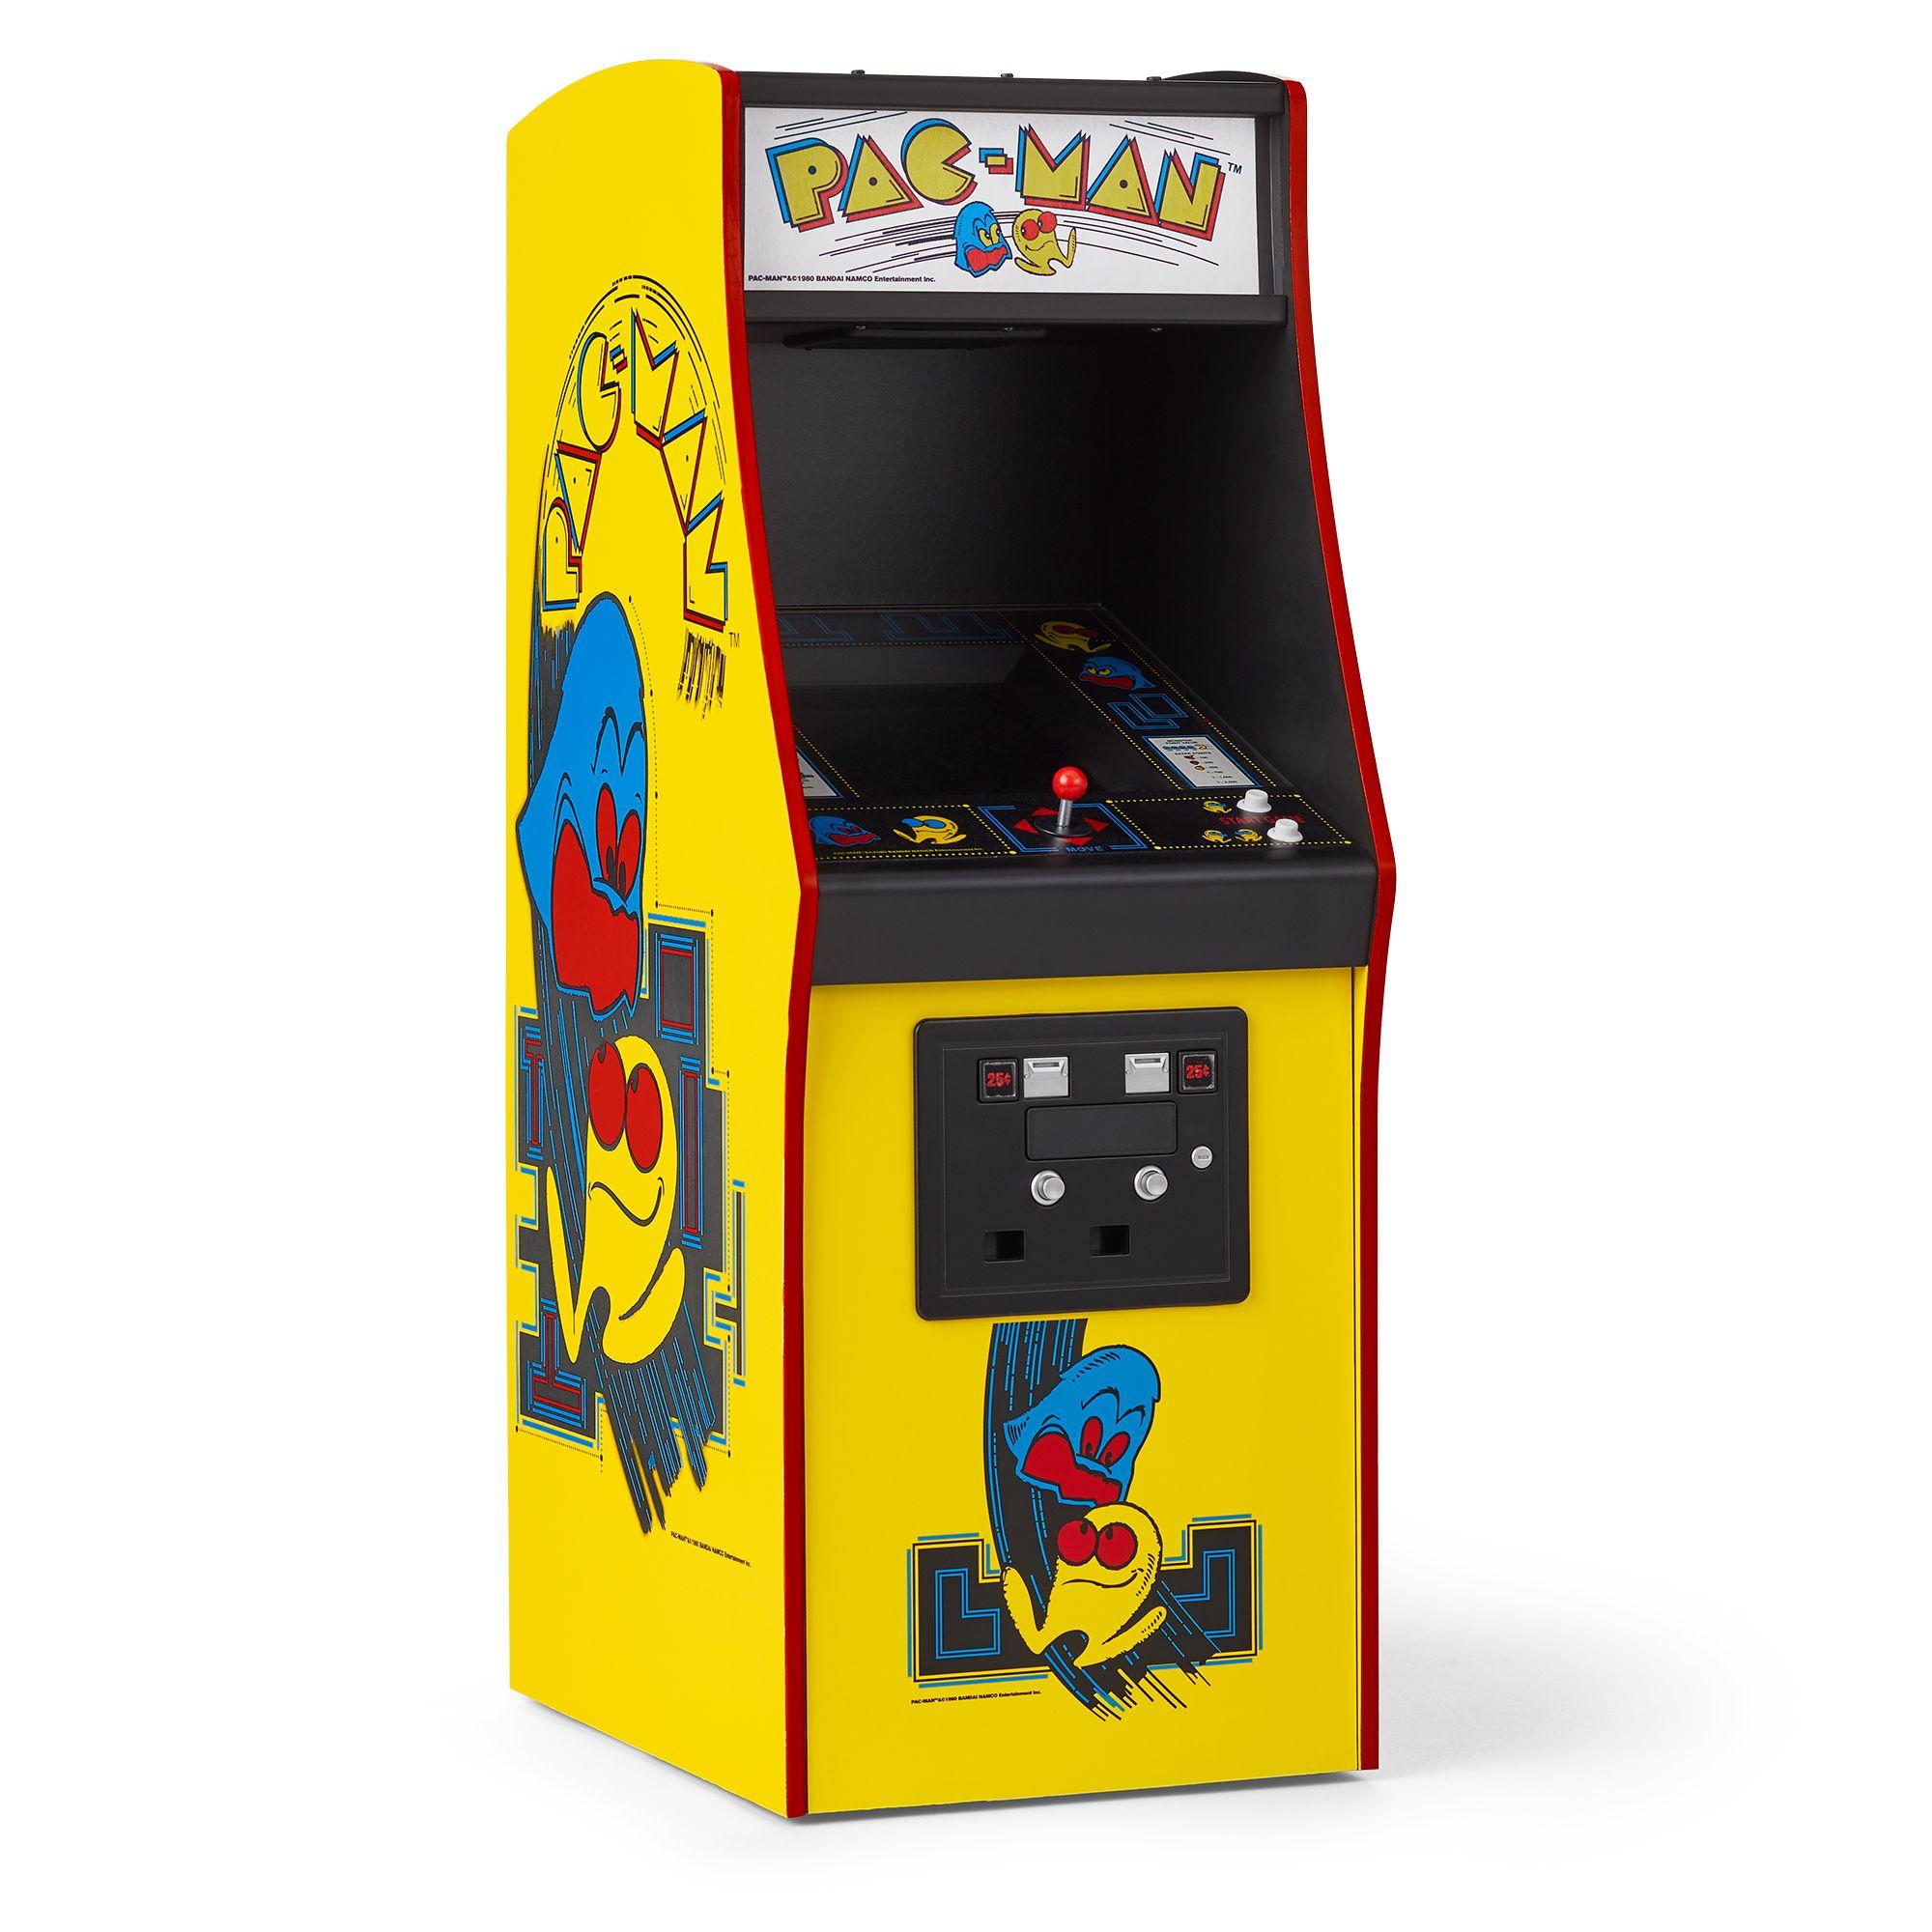 Courtney's PAC-MAN Arcade Game